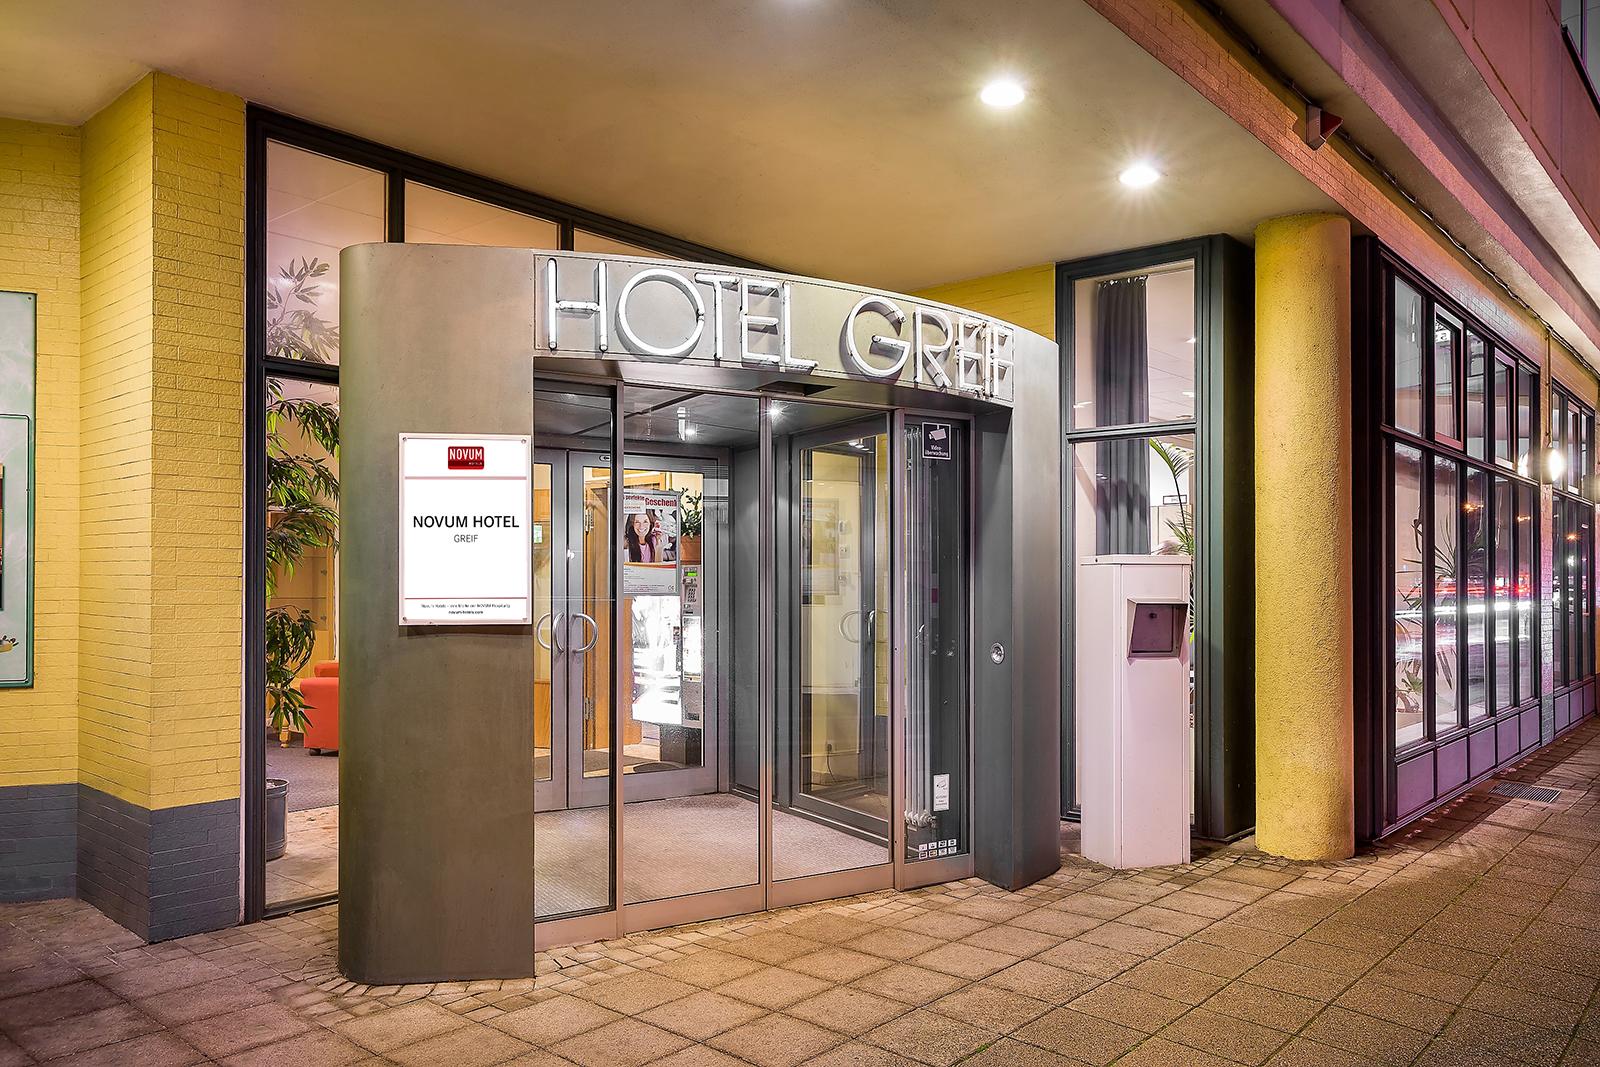 Novum Hotel Greif, Karlsruhe